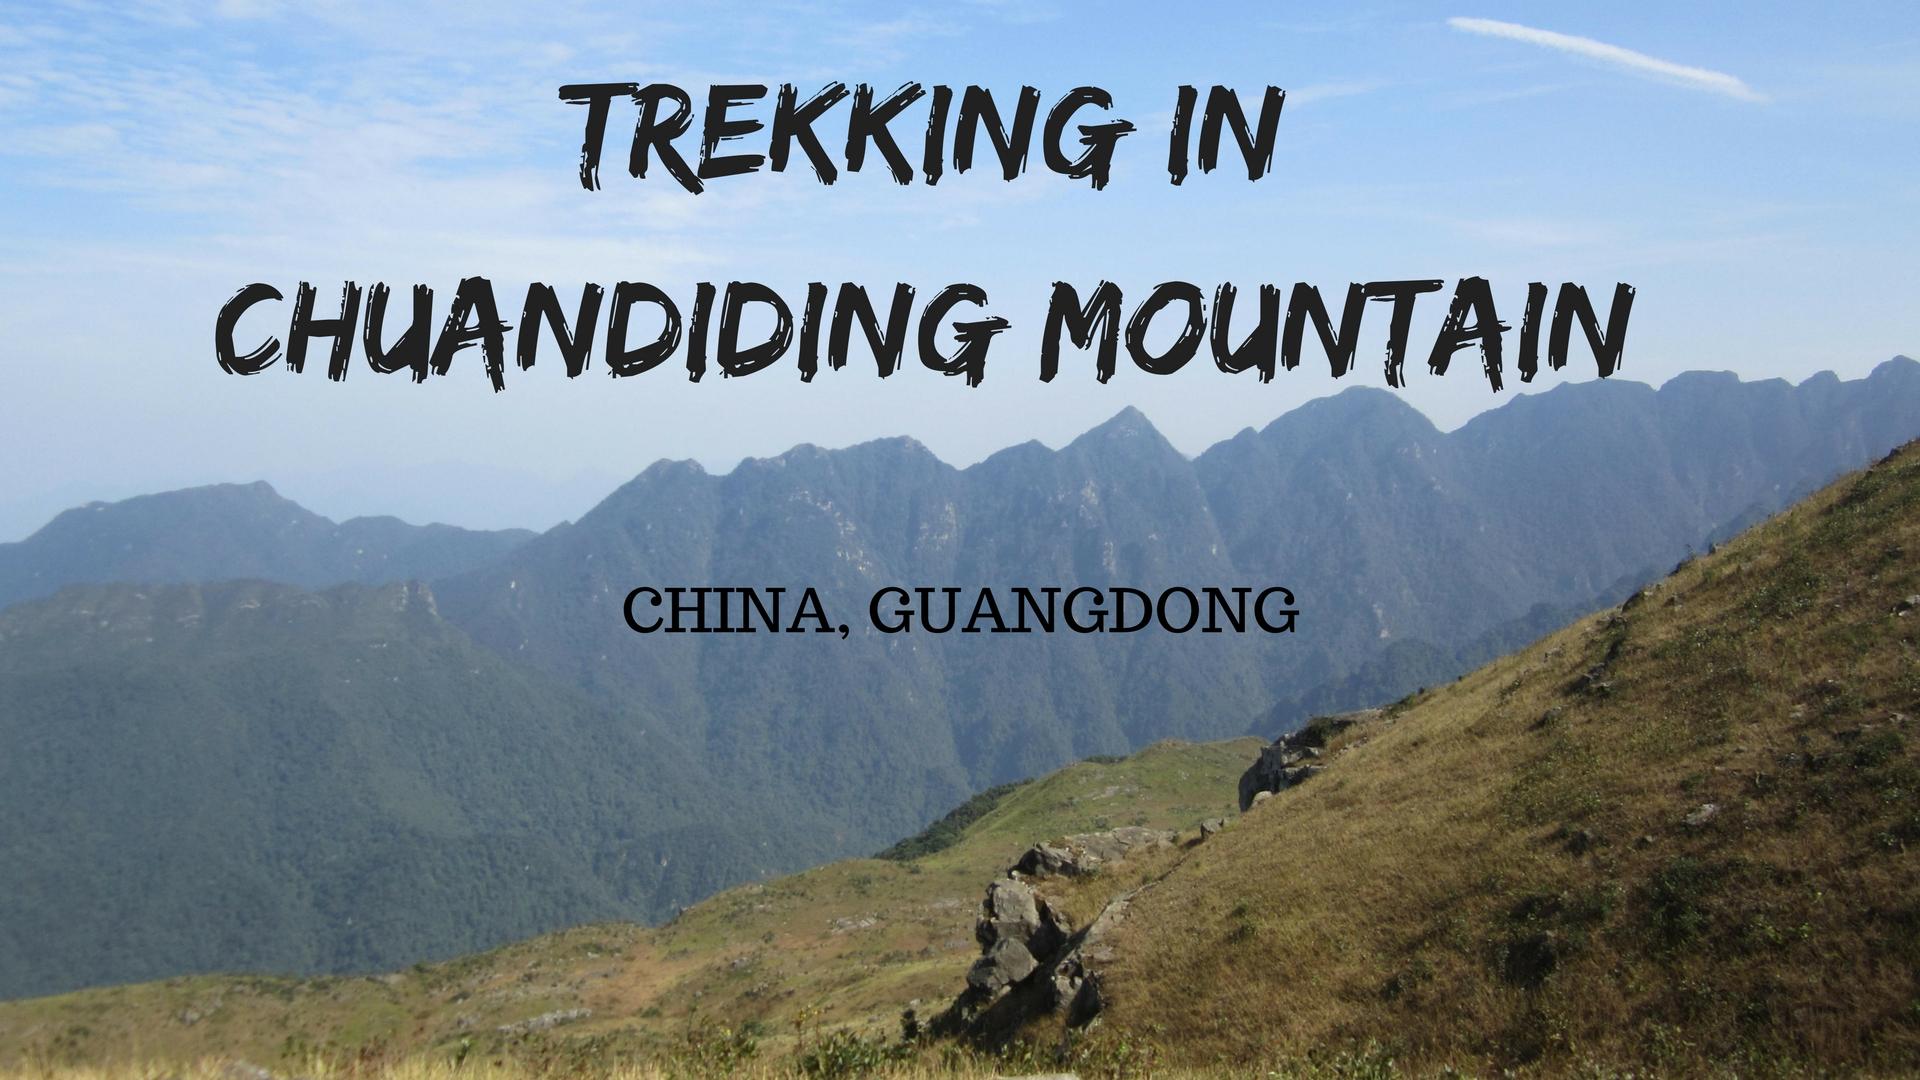 TREKKING IN CHUANDIDING, GUANGDONG PROVINCE